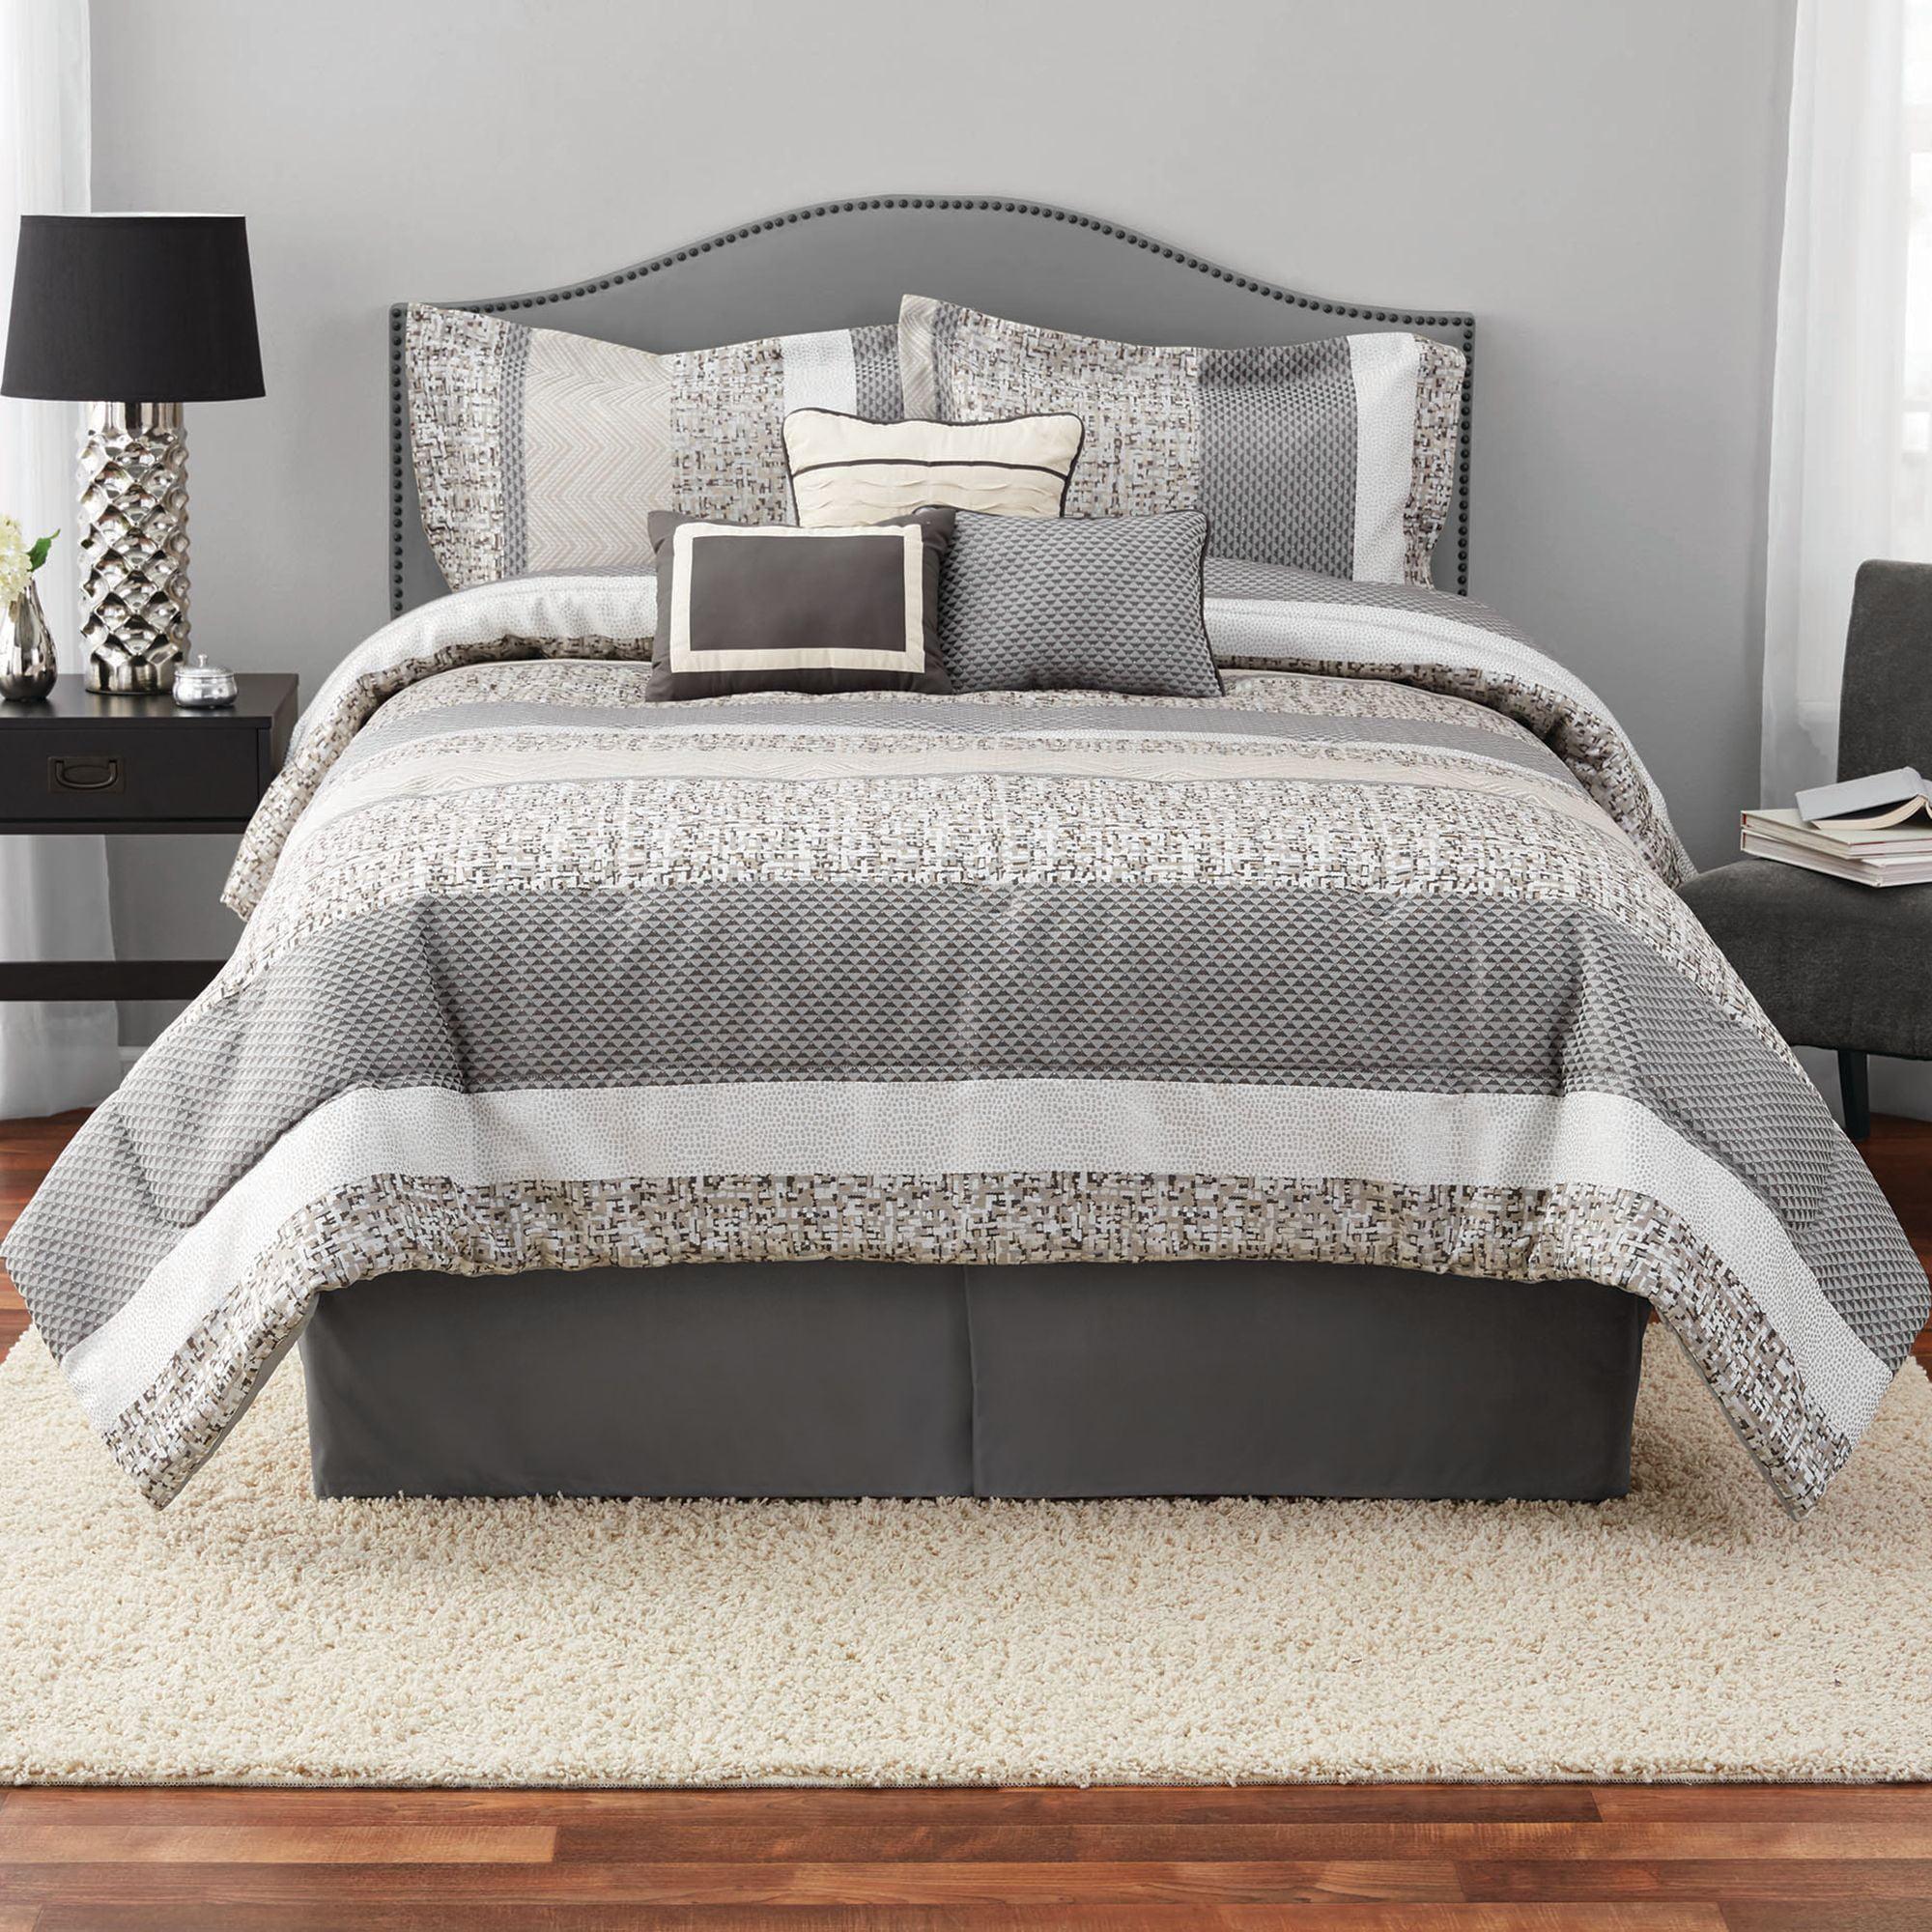 Mainstays Silver Stripe 7 Piece Comforter Set with Bedskirt by HANGZHOU BENRUSON HOME TEXTILES CO.,LTD.